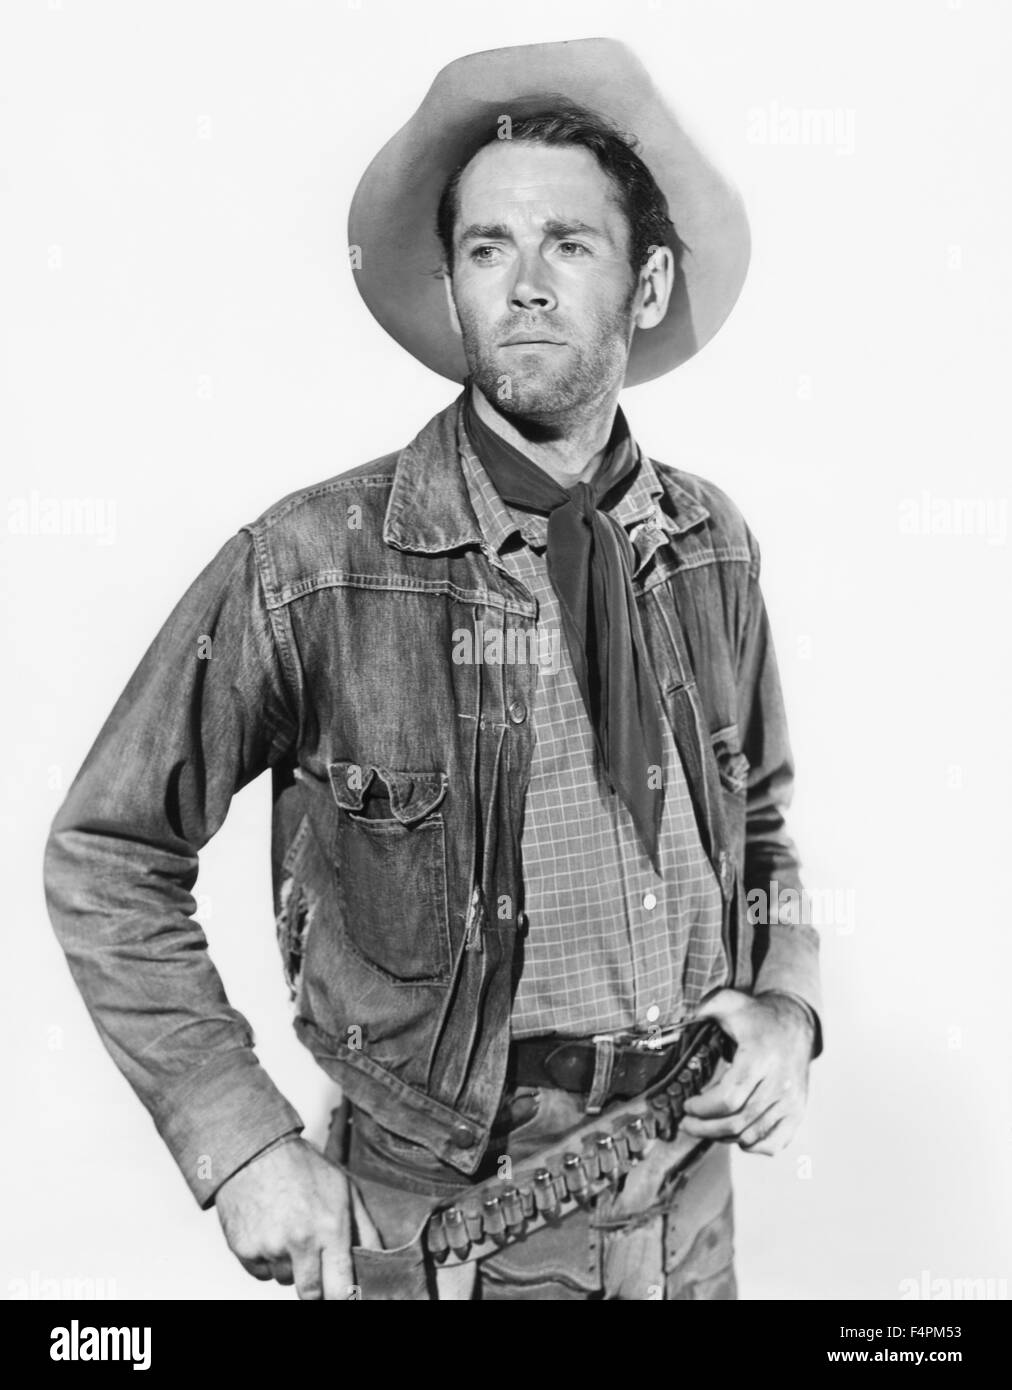 Henry Fonda / The Ox-Bow Incident / 1943 directed by William A. Wellman [Twentieth Century Fox Film Corpo] - Stock Image